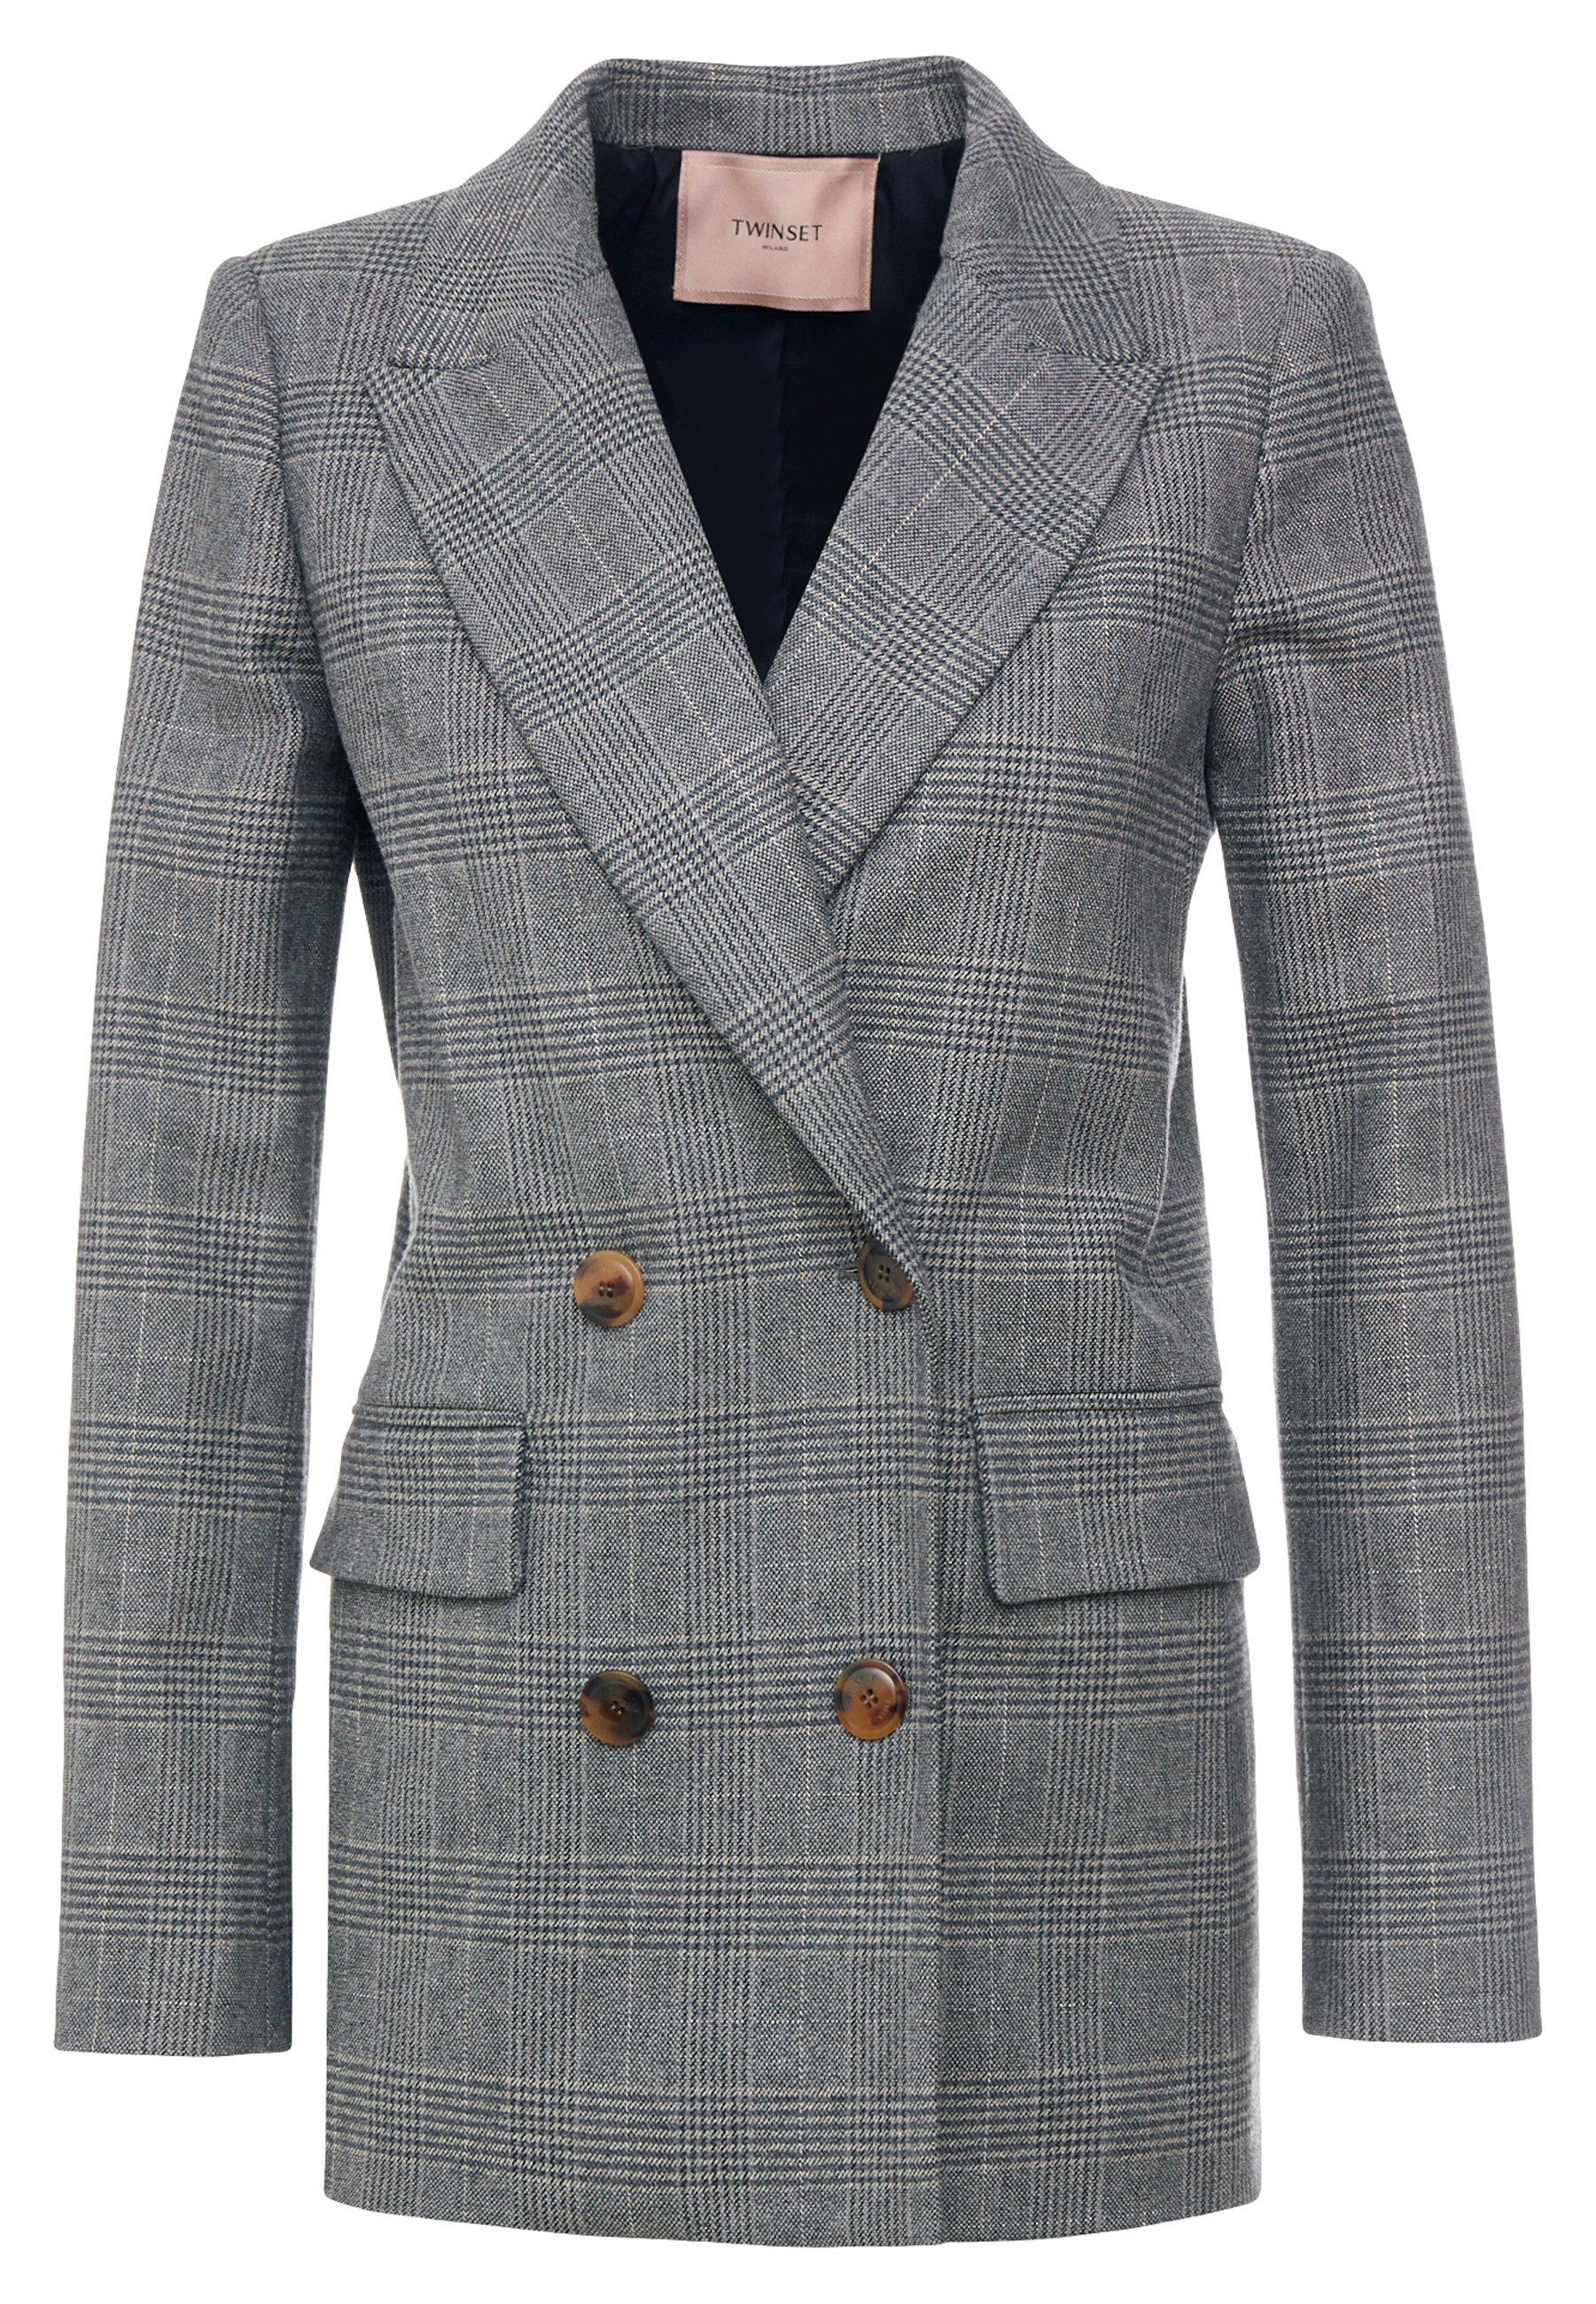 Twinset Lunga Disegno Galles - Blazer Dark Grey 5uqQTDqk